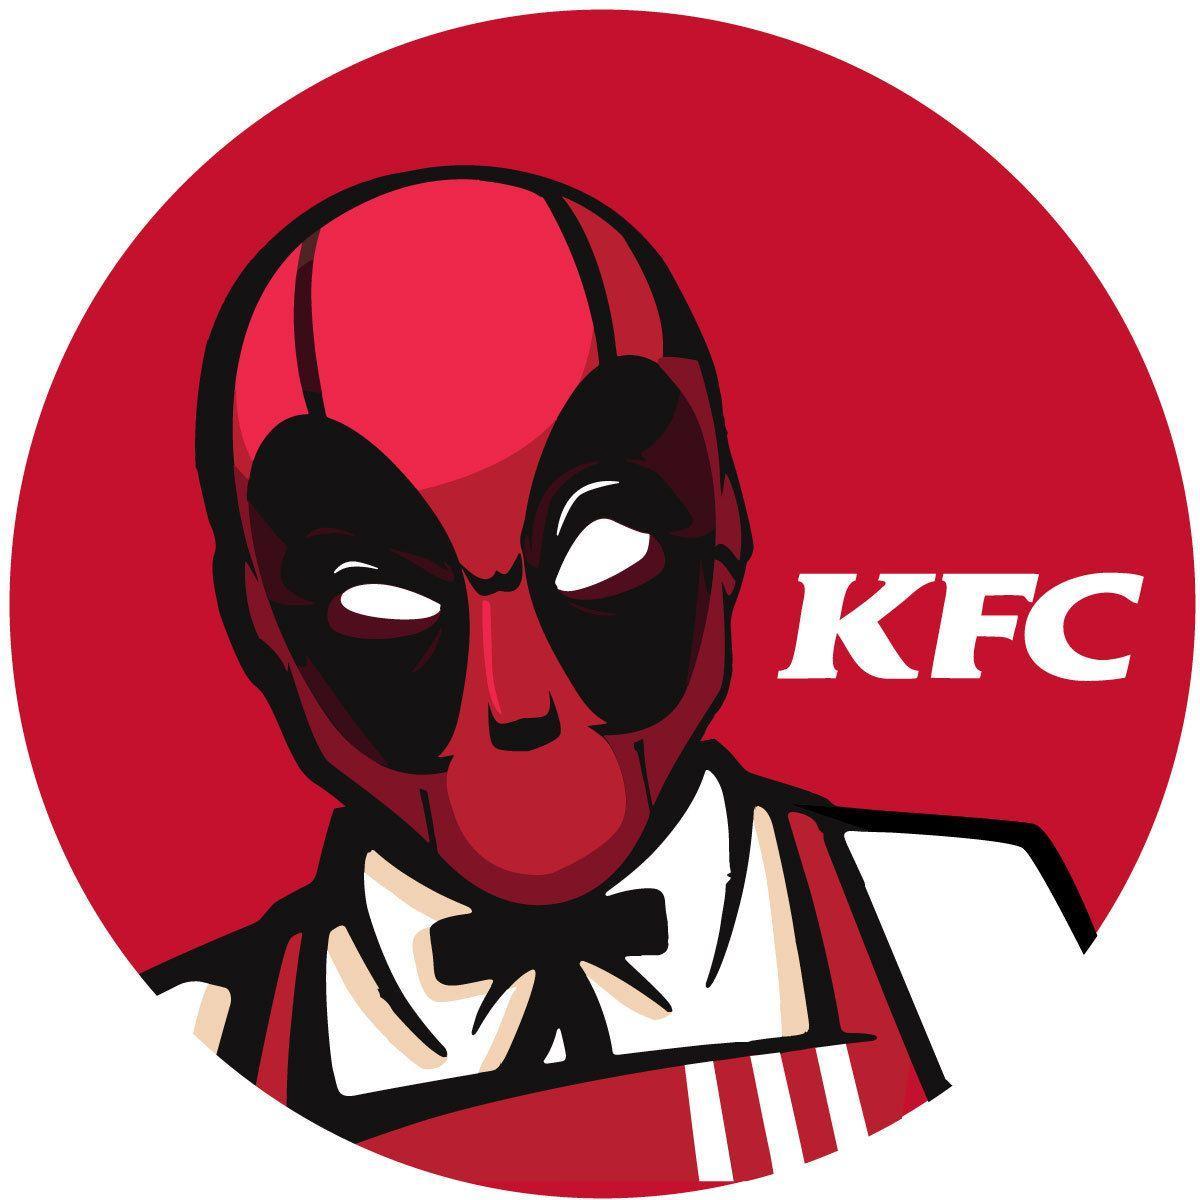 KFC Wallpapers - Wallpaper Cave